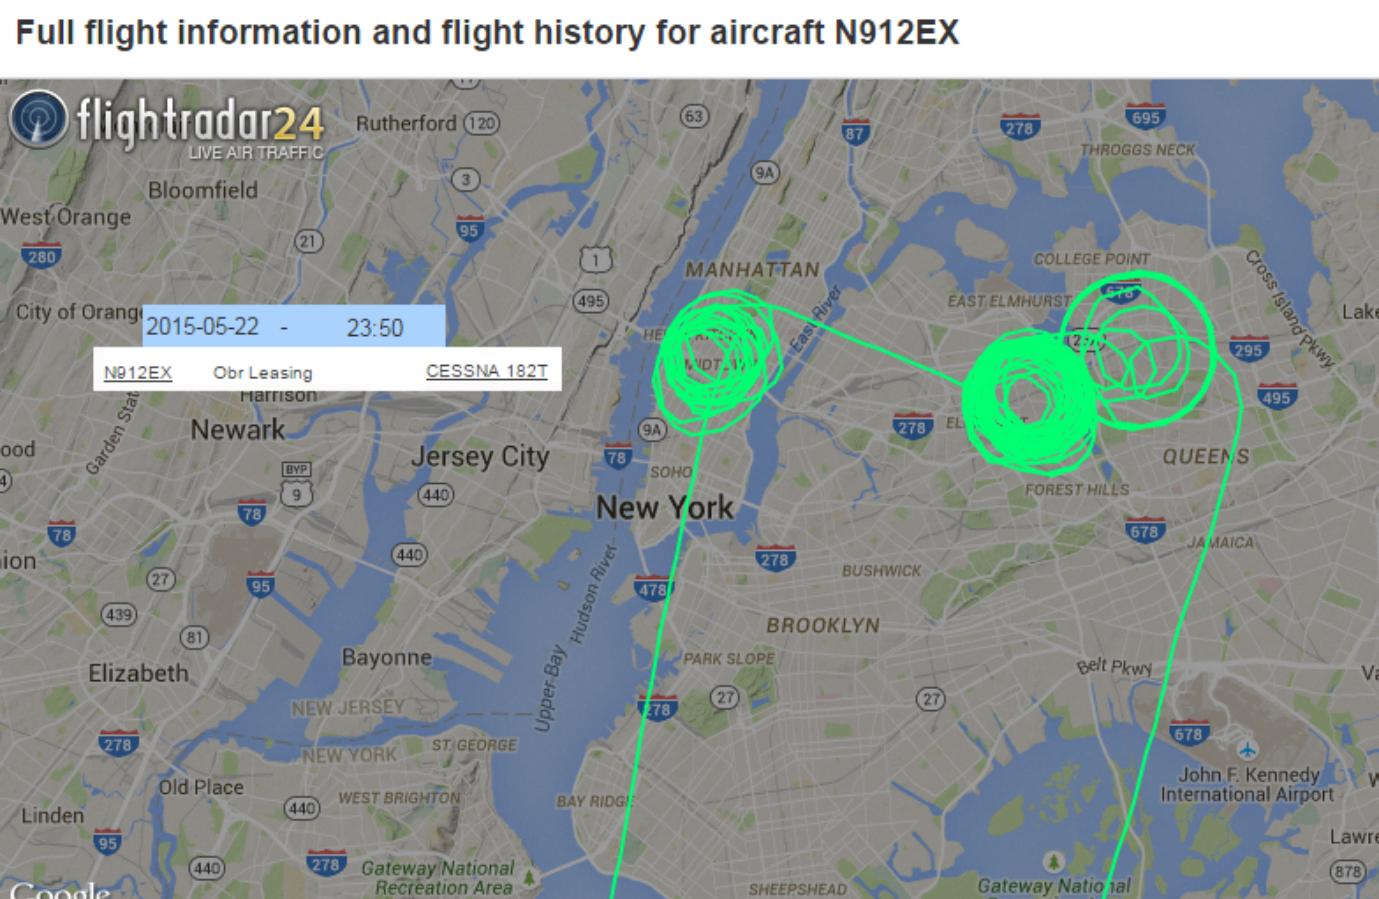 Bizarre flightpaths hovering over New York City